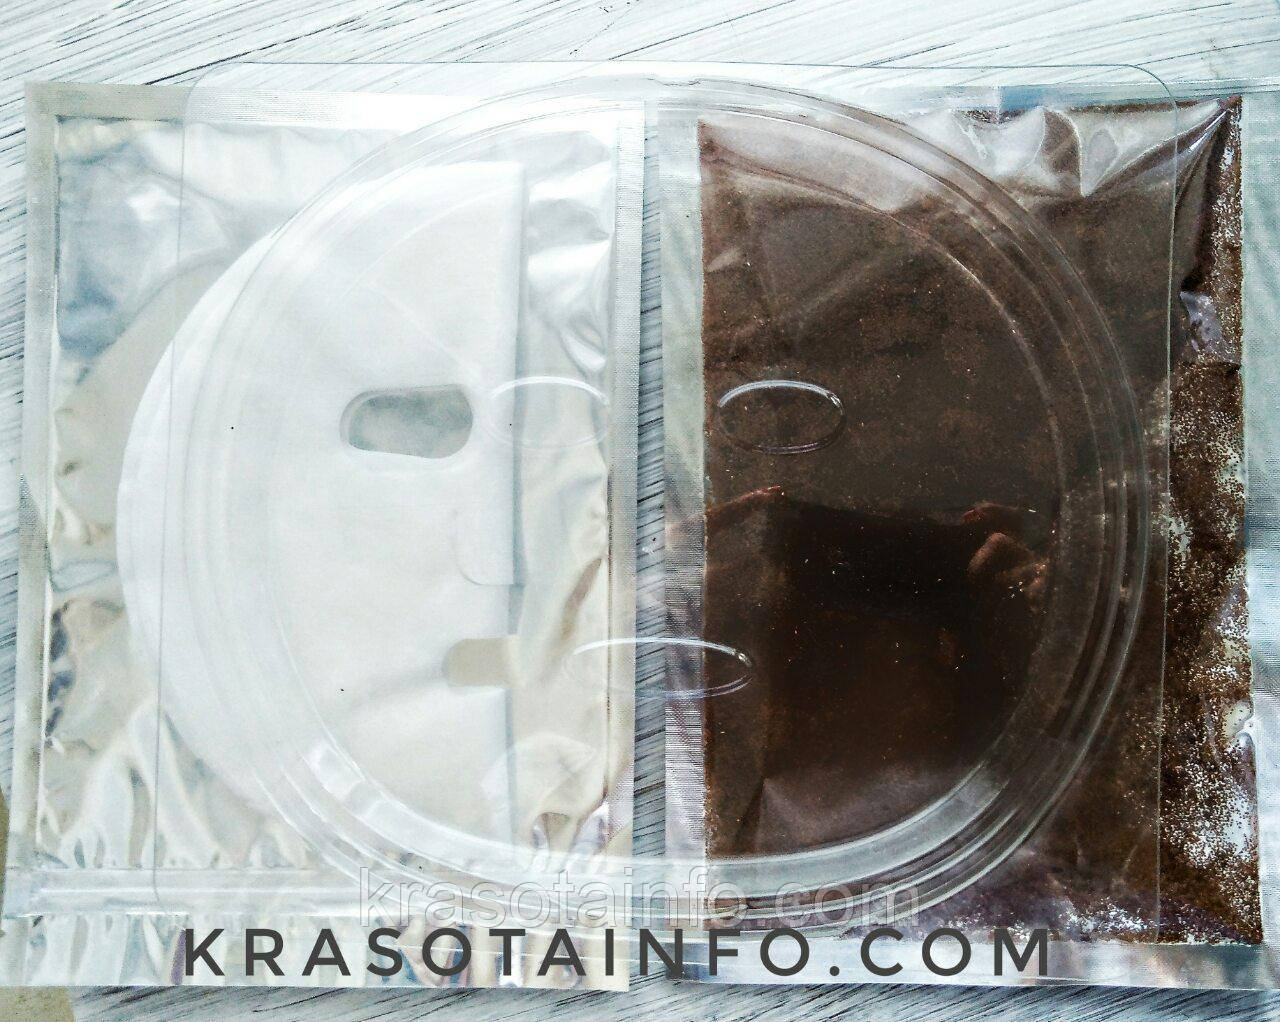 Seaweed Mask маска из семян бурых морских водорослей на тканевой основе, набор 15 шт масок + форма, 150 г